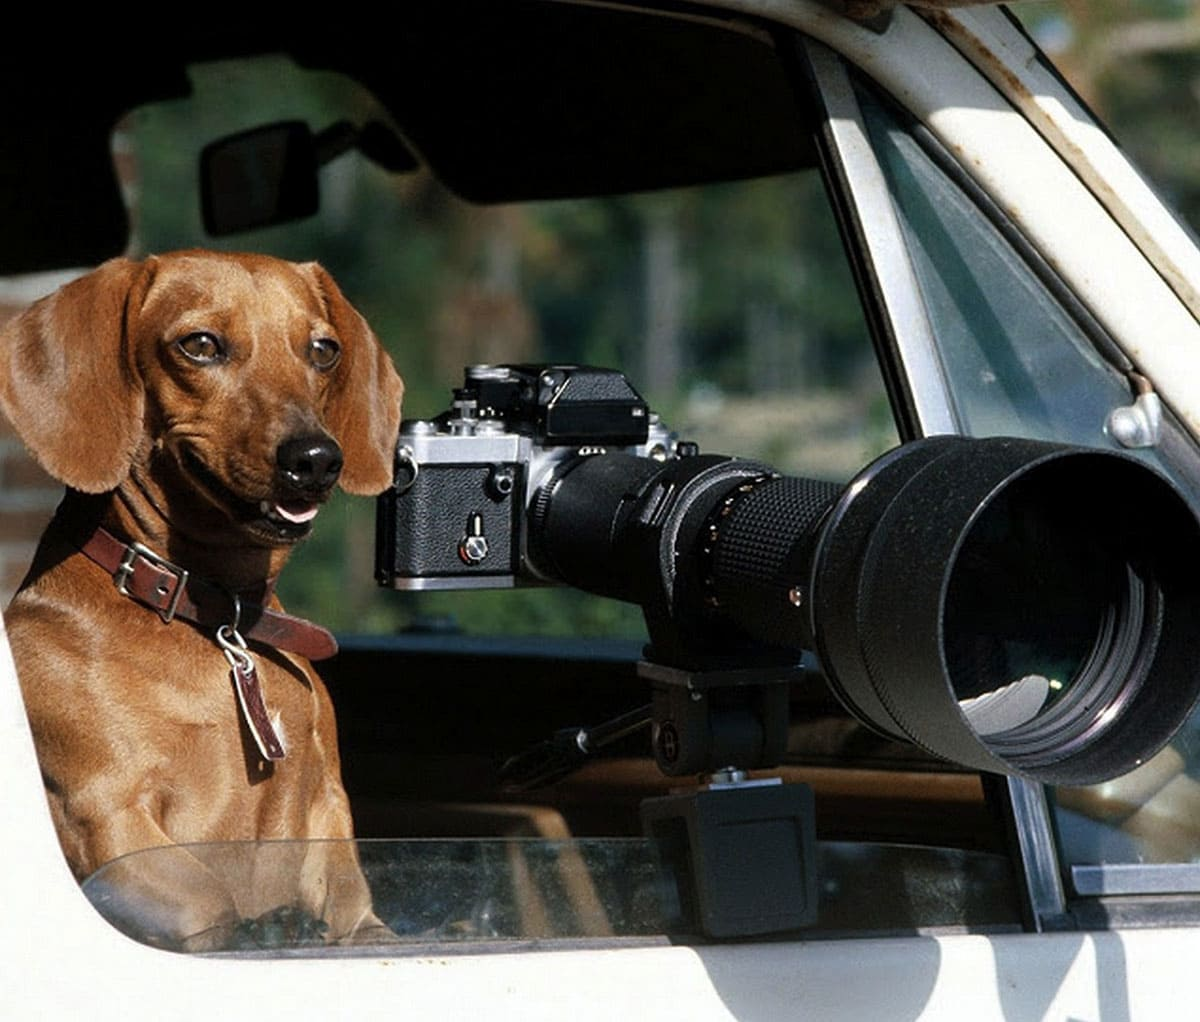 Dog sitting next to a camera